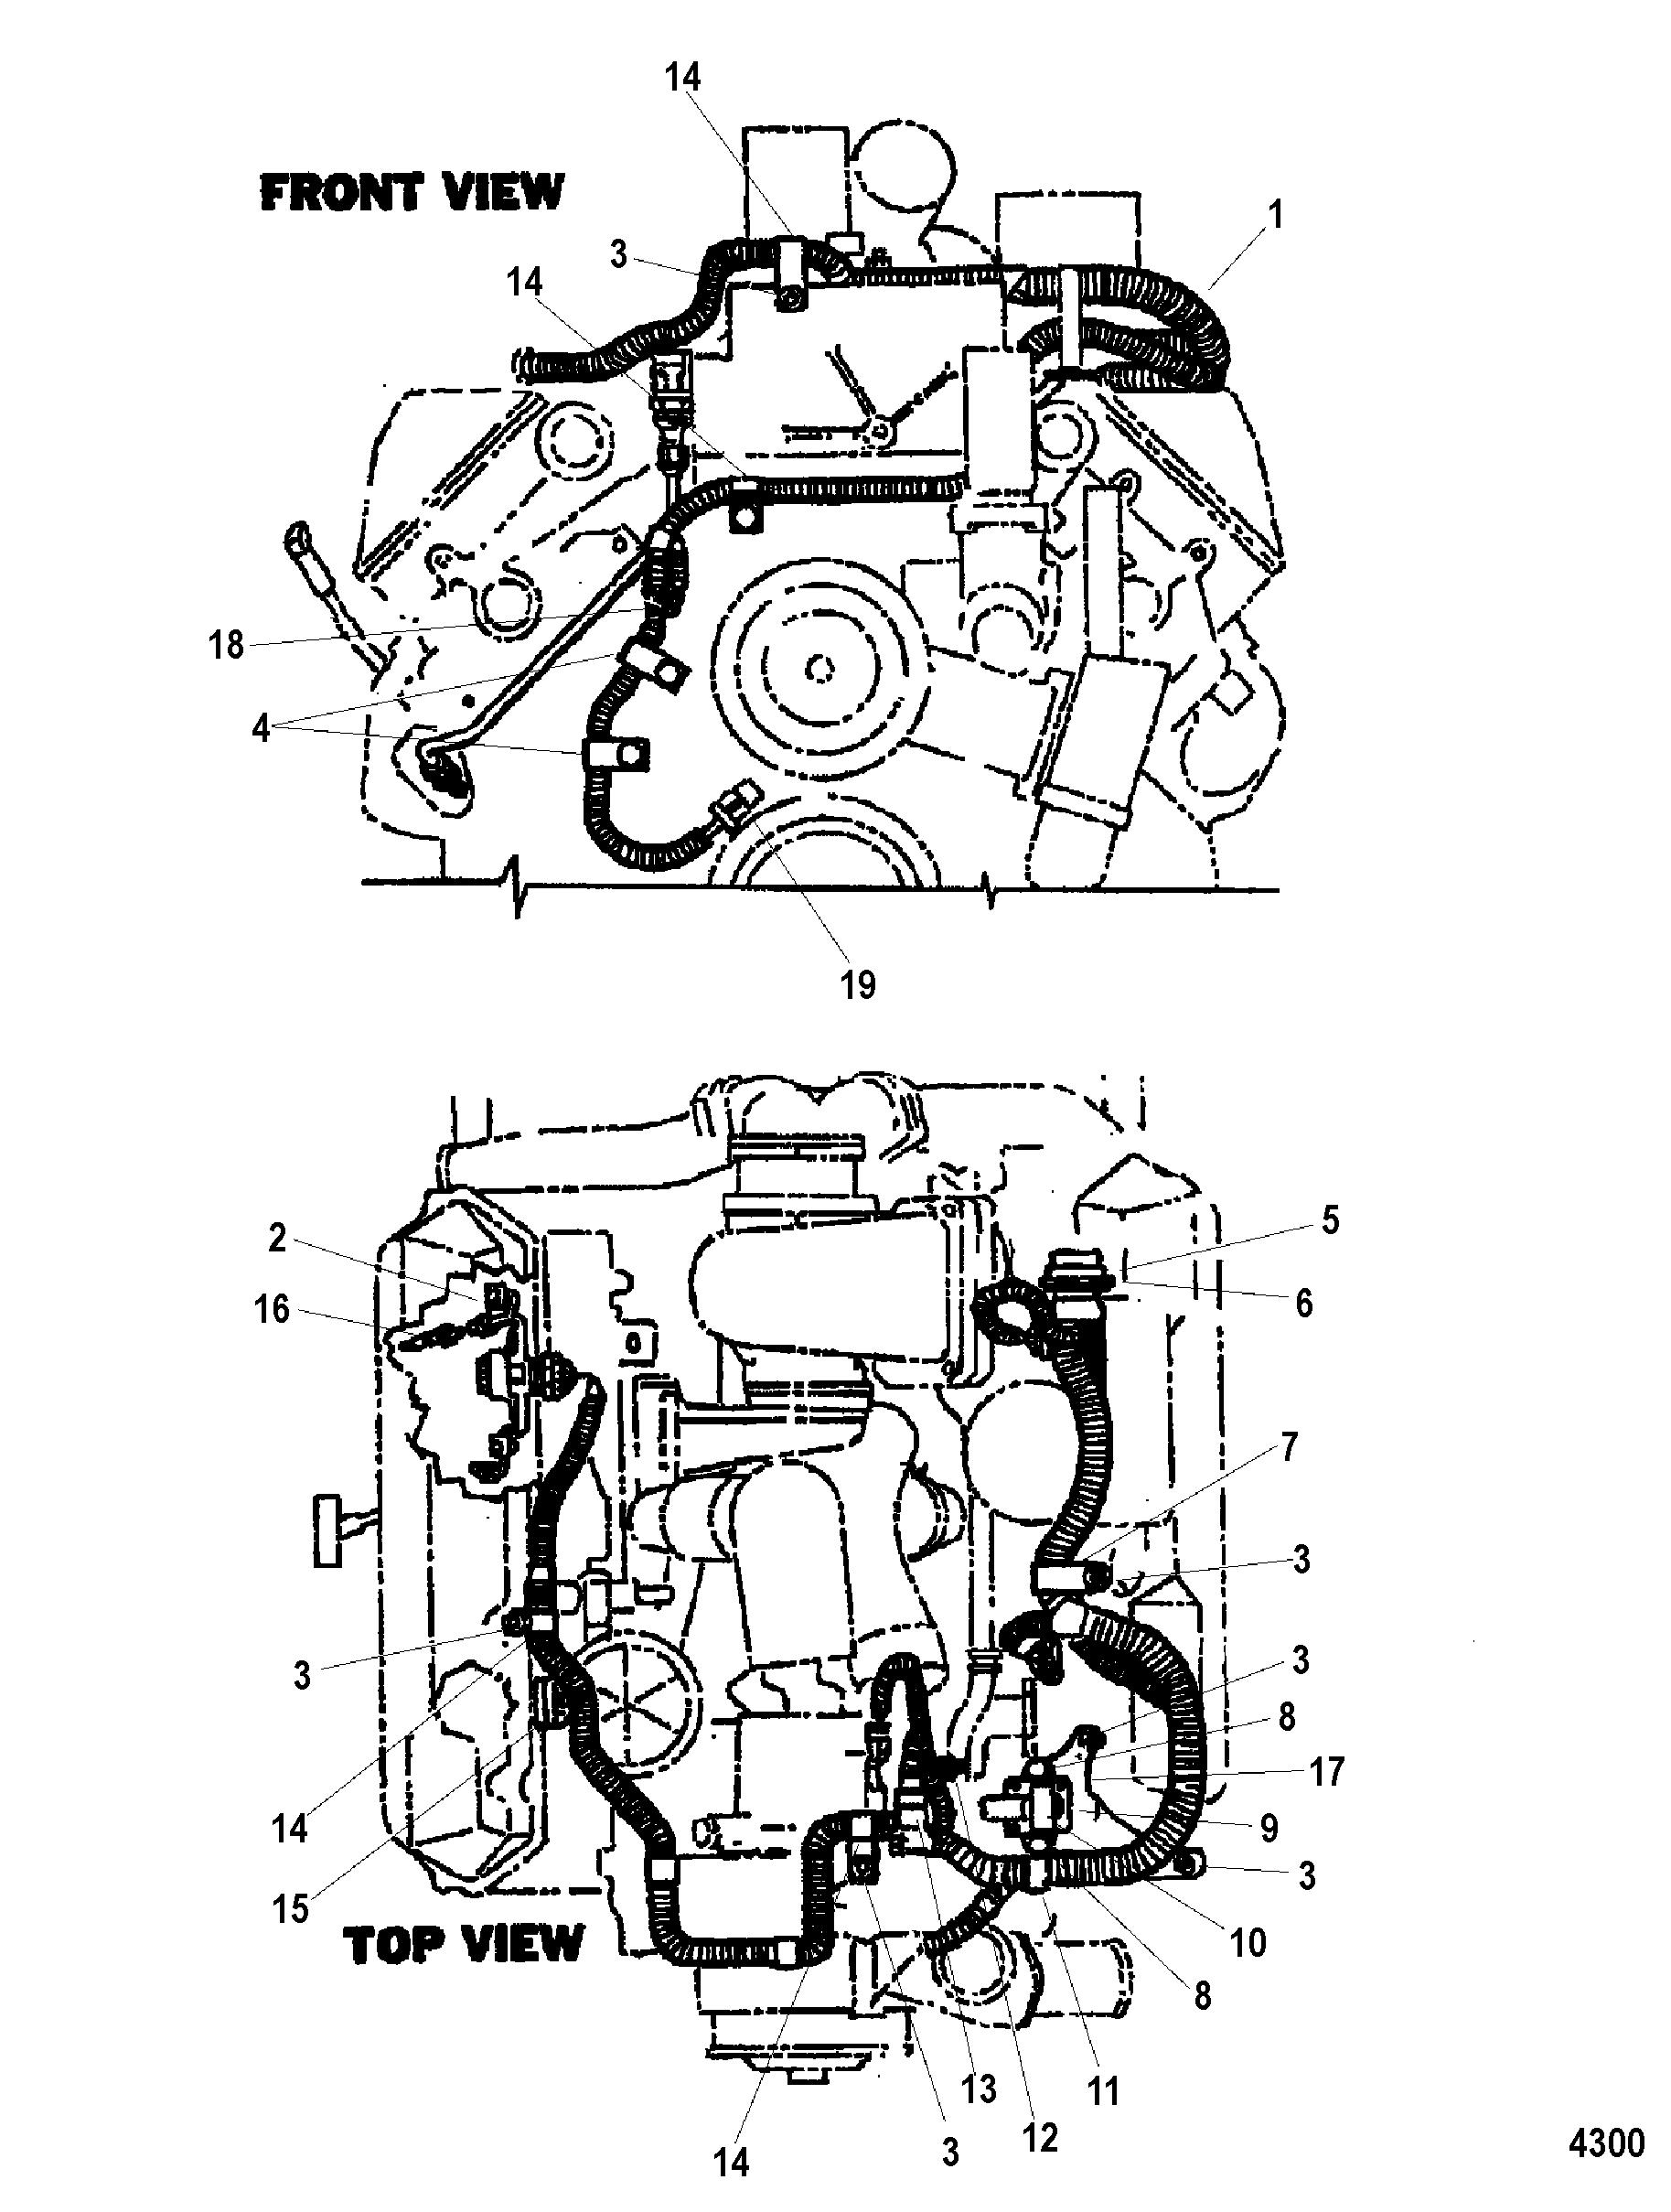 engine wiring harness for mercruiser cummins mercruiser diesel 7 3l d tronic bravo